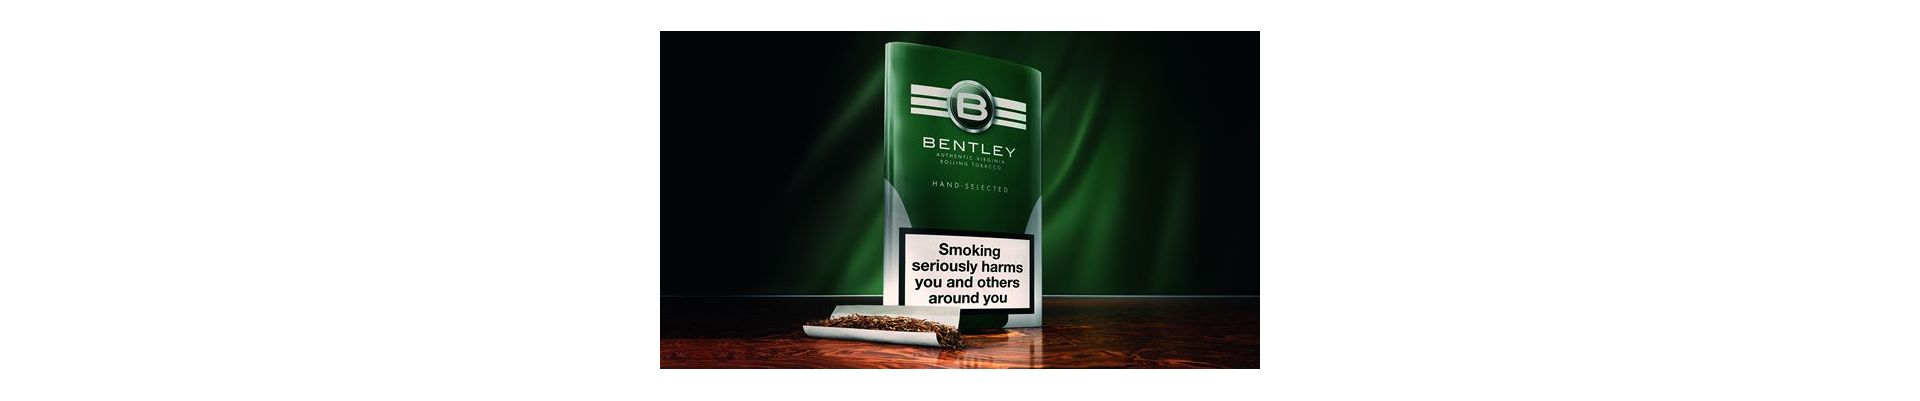 Tutun pentru pipa Bentley.Magazin tutun pentru pipa Bentley.Cumpara tutun de pipa Bentley.